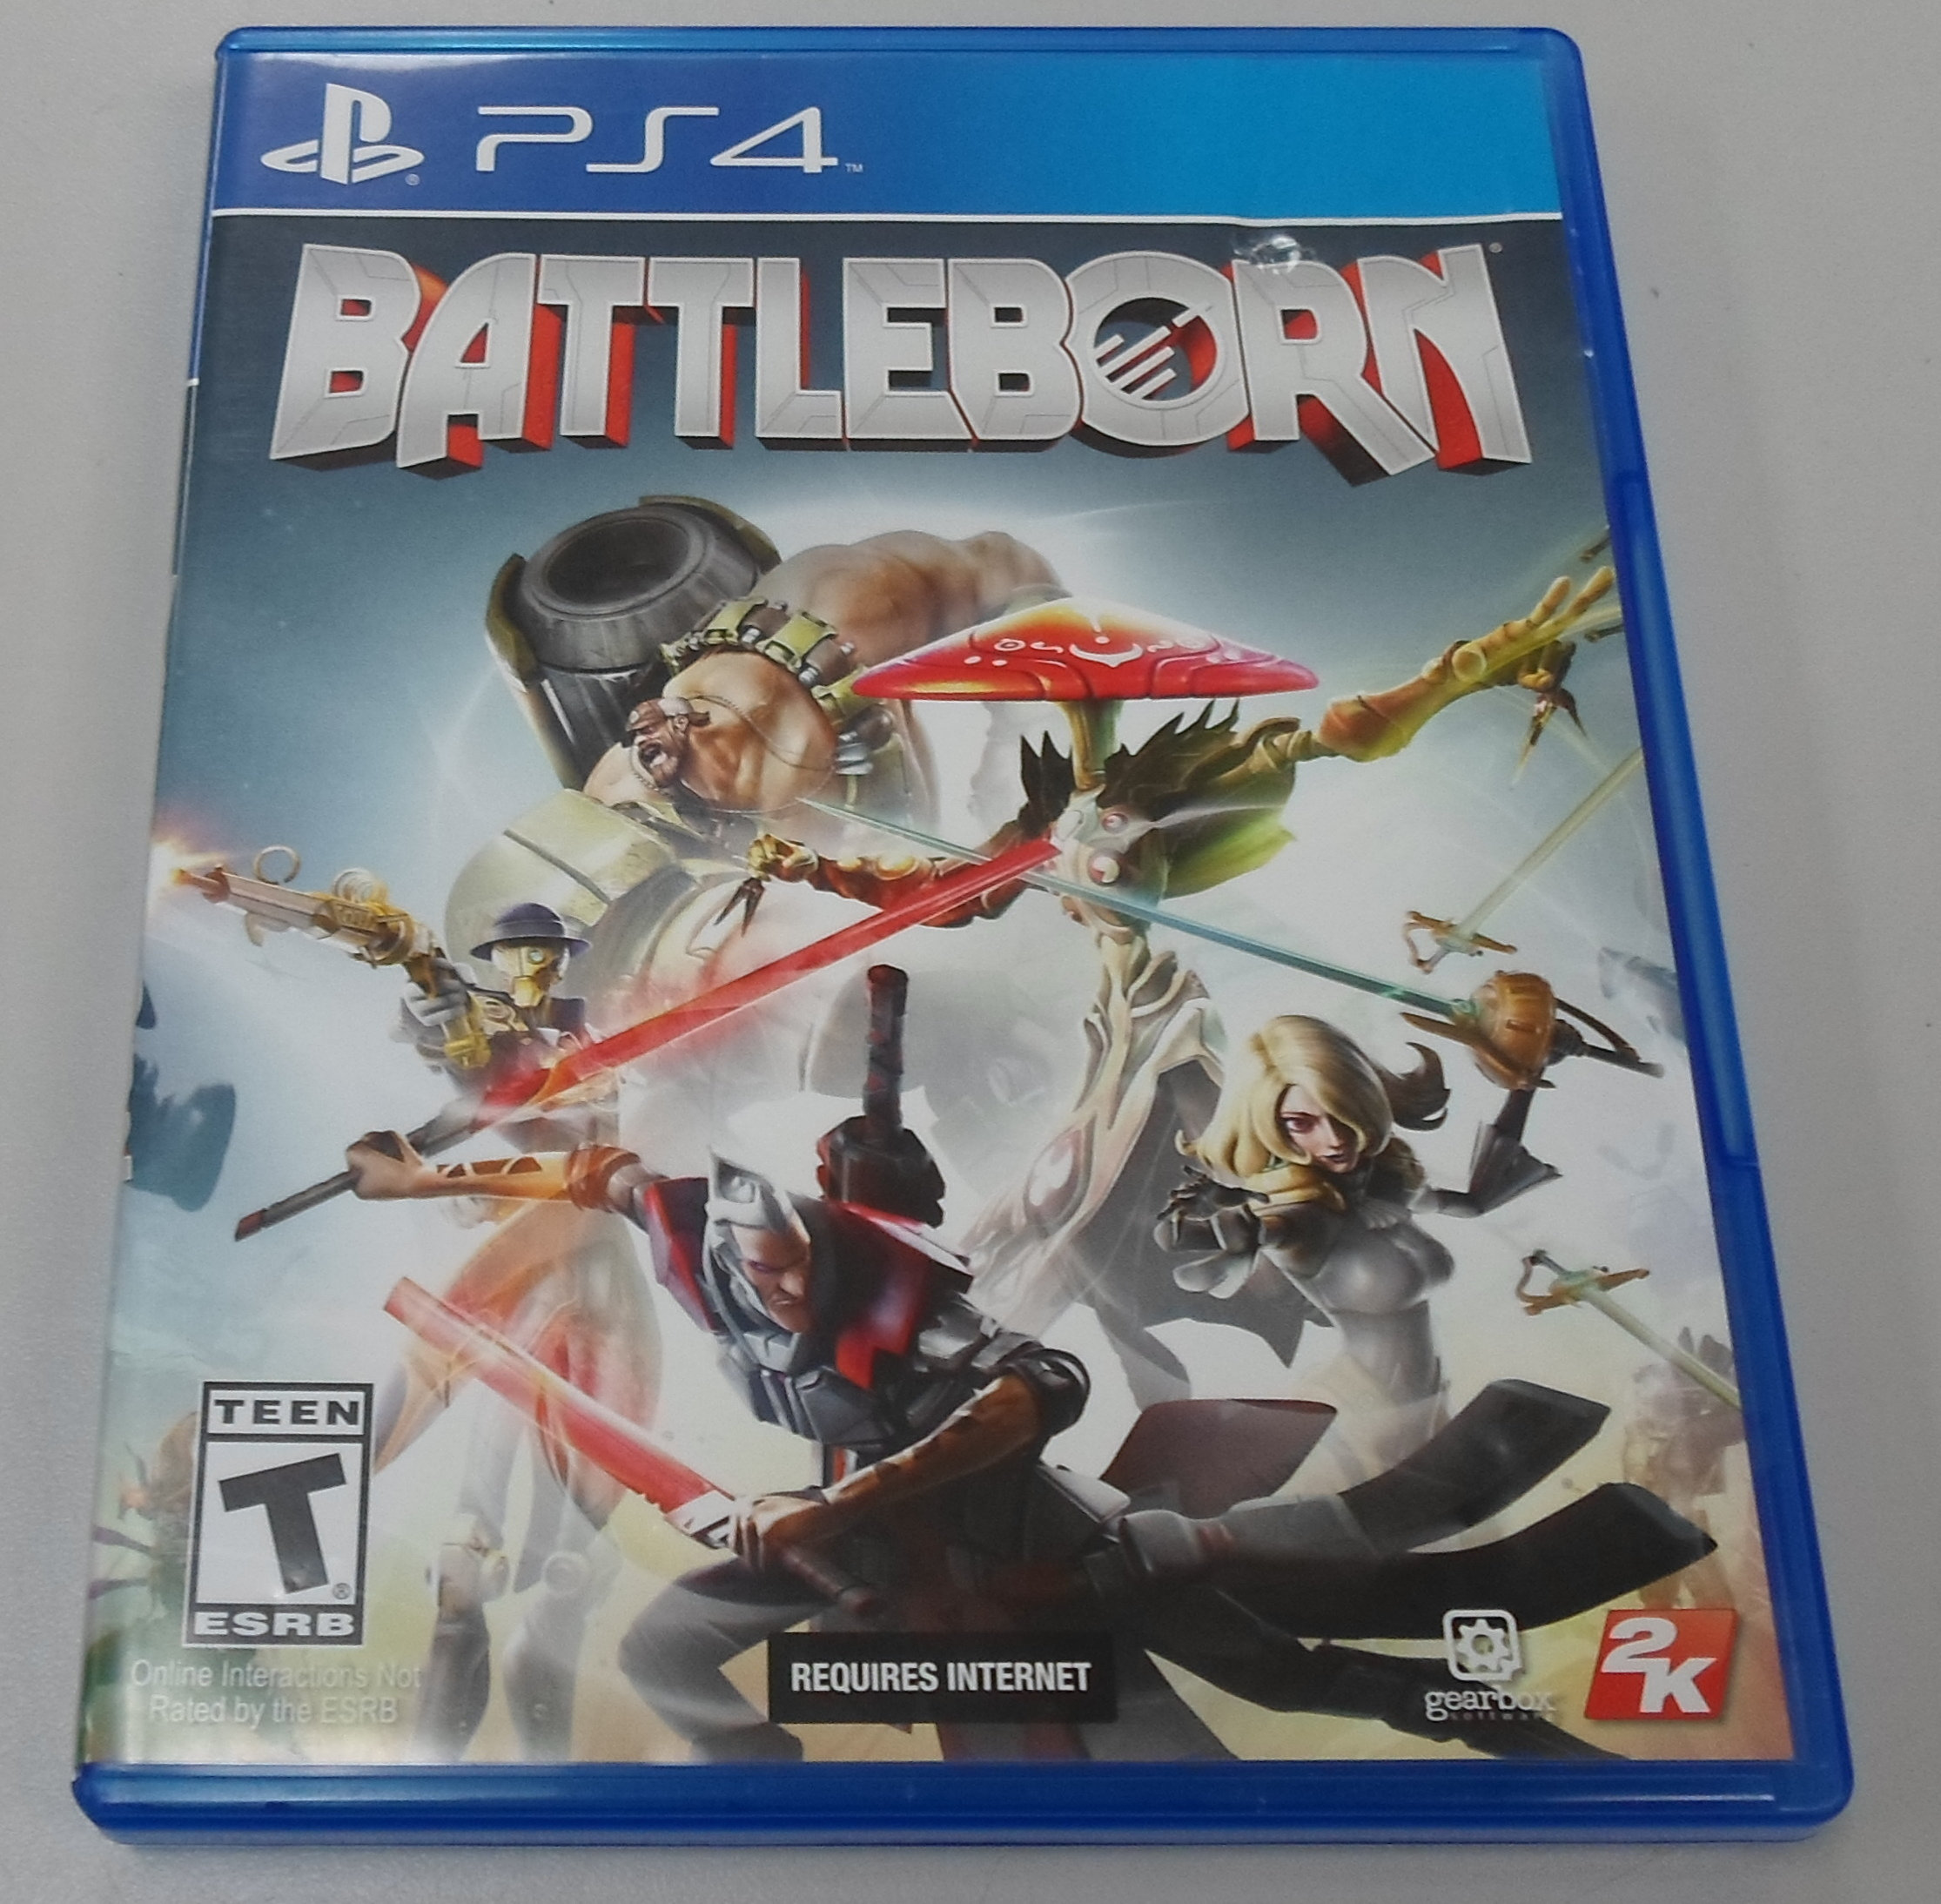 BATTLEBORN  - PS 4 GAME